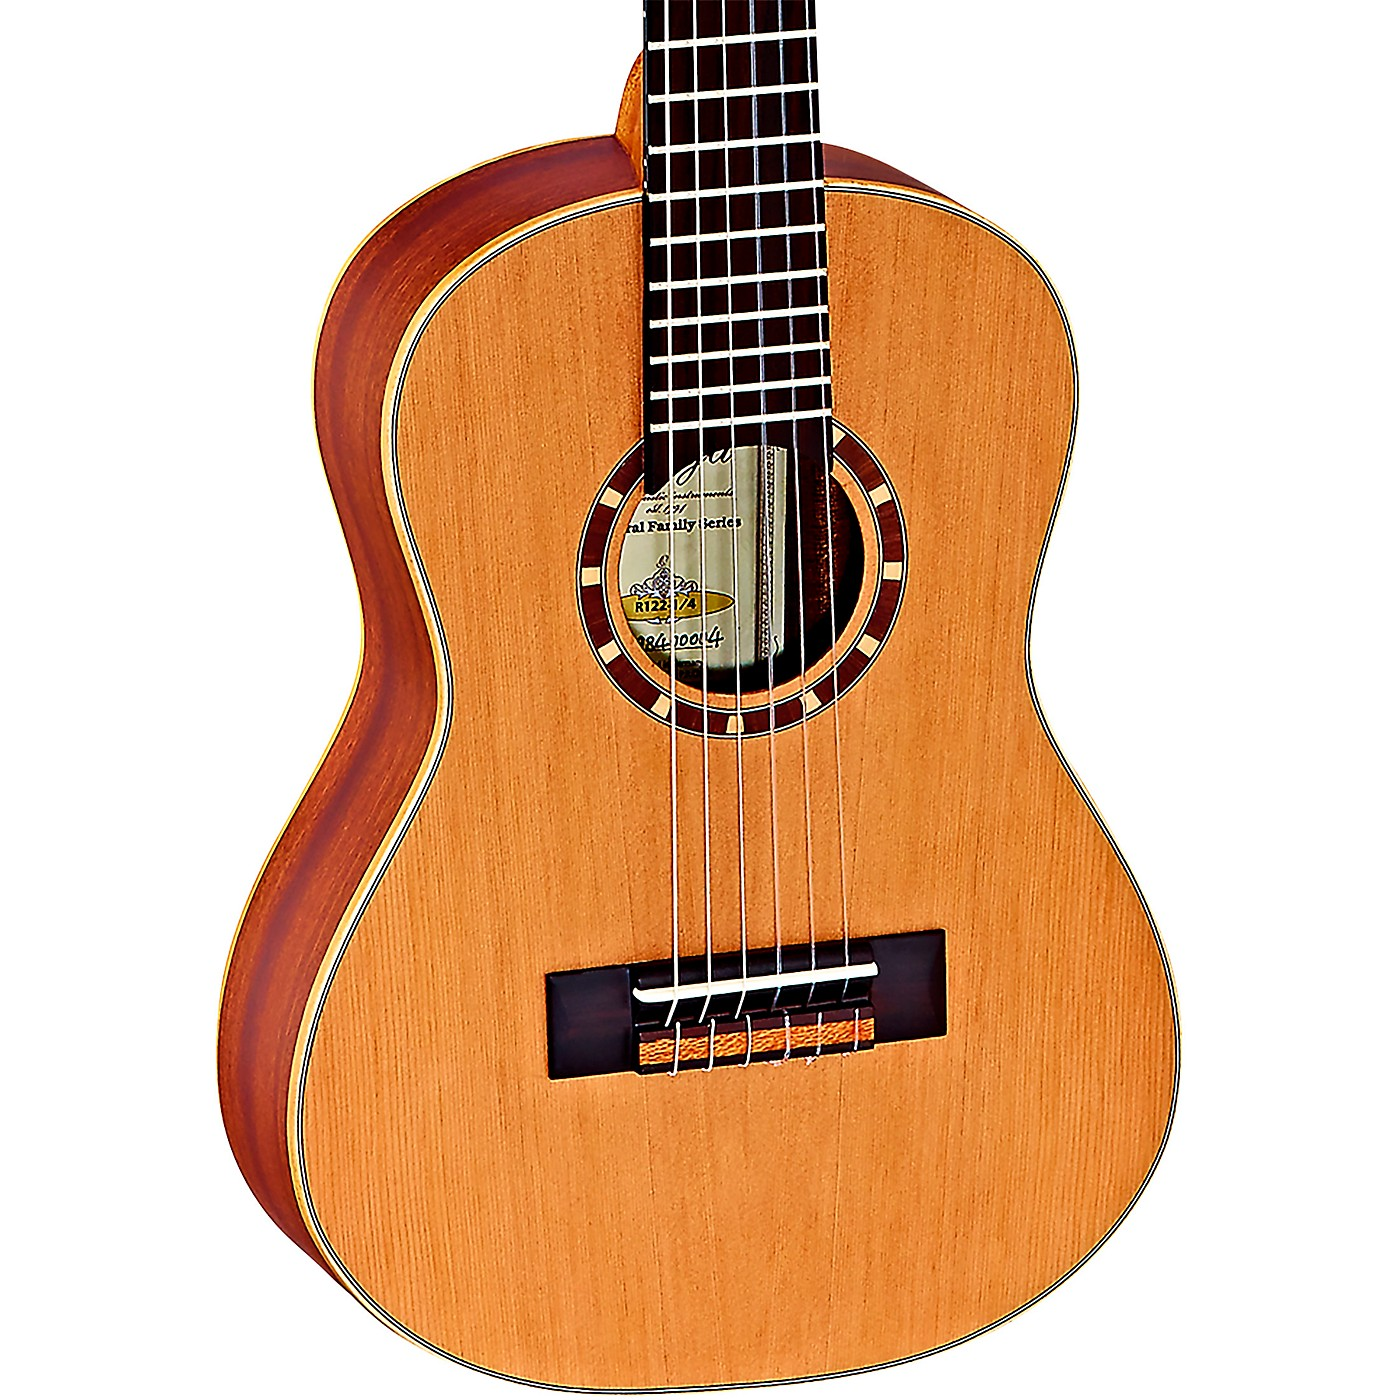 Ortega Family Series R122-1/4 1/4 Size Classical Guitar thumbnail